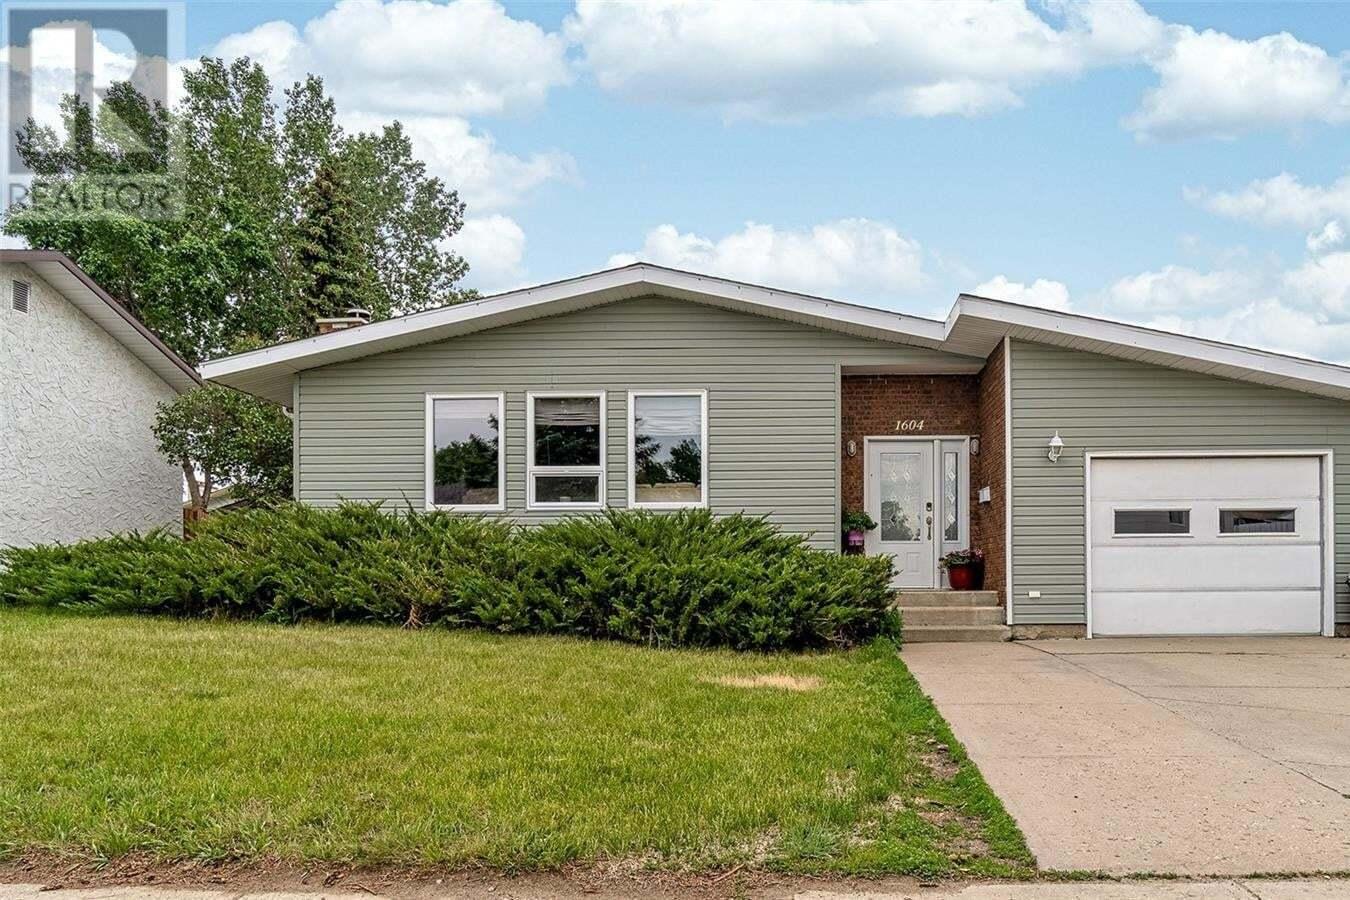 House for sale at 1604 Dunn St Moose Jaw Saskatchewan - MLS: SK813424